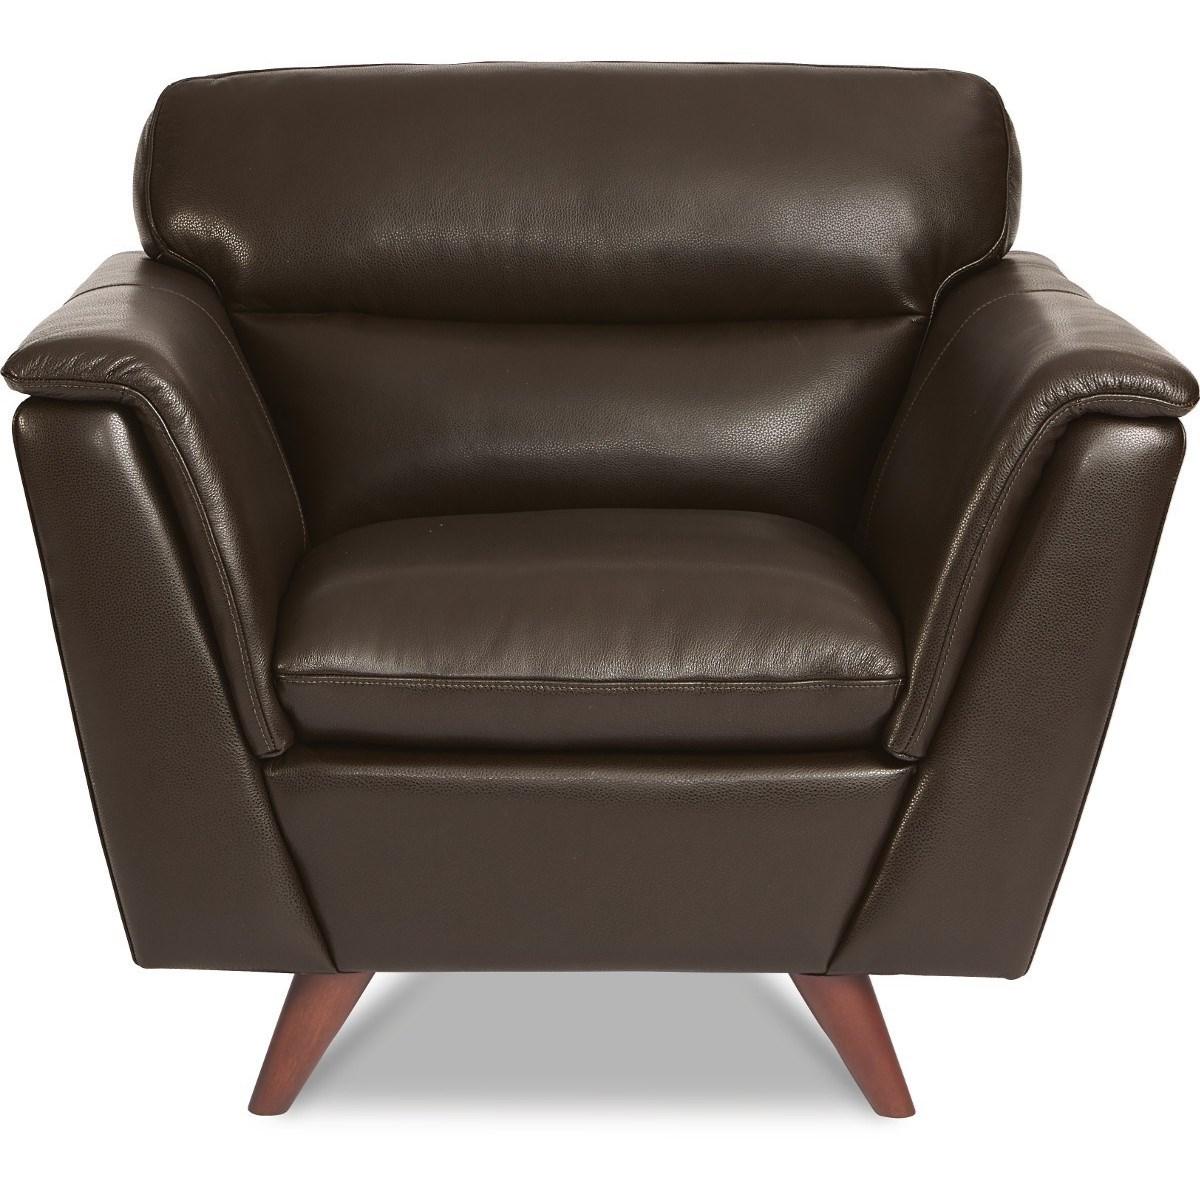 Charmant La Z Boy Arrow Mid Century Modern Leather Chair